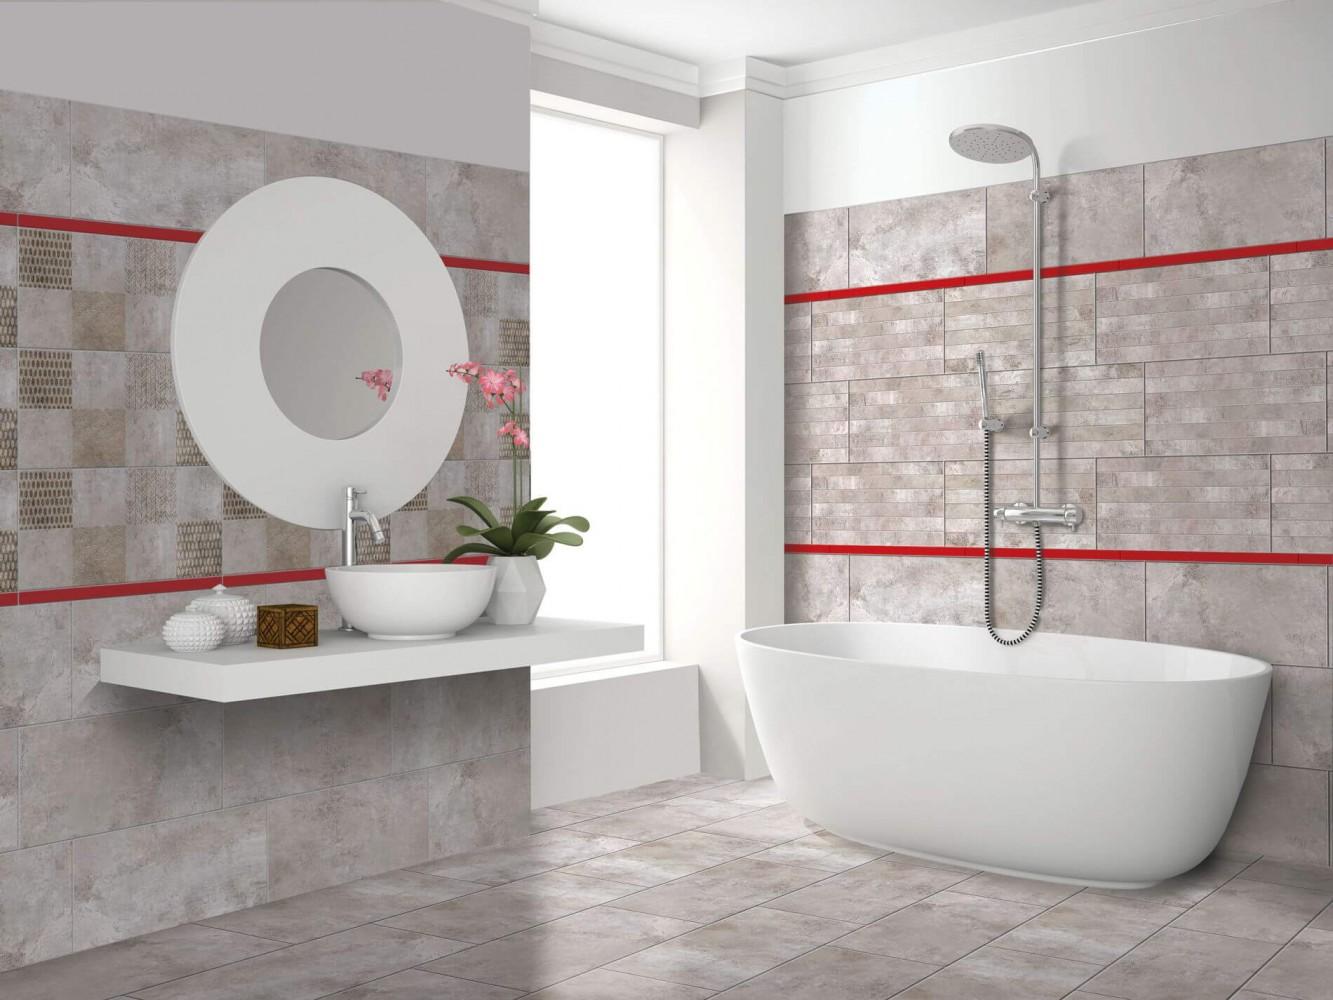 Decor sticla Cesarom® CRUST 2x60 cm, rosu